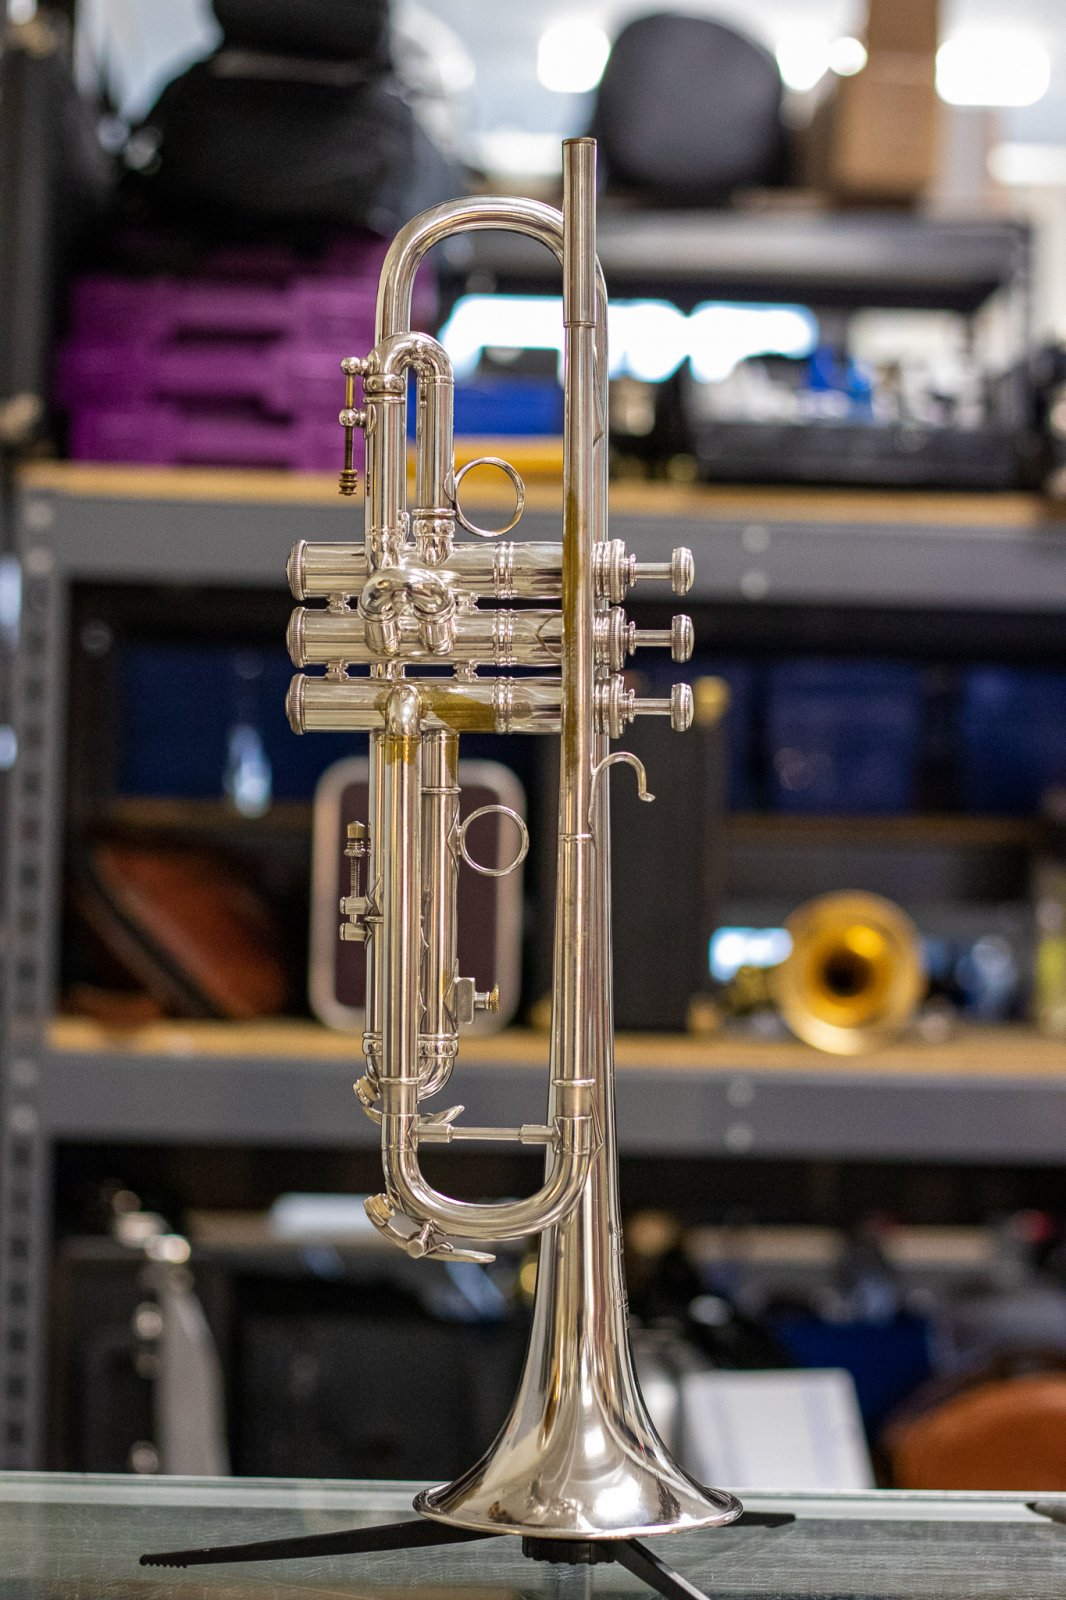 Max Schlossberg's 1929 NY Bach 6L/6